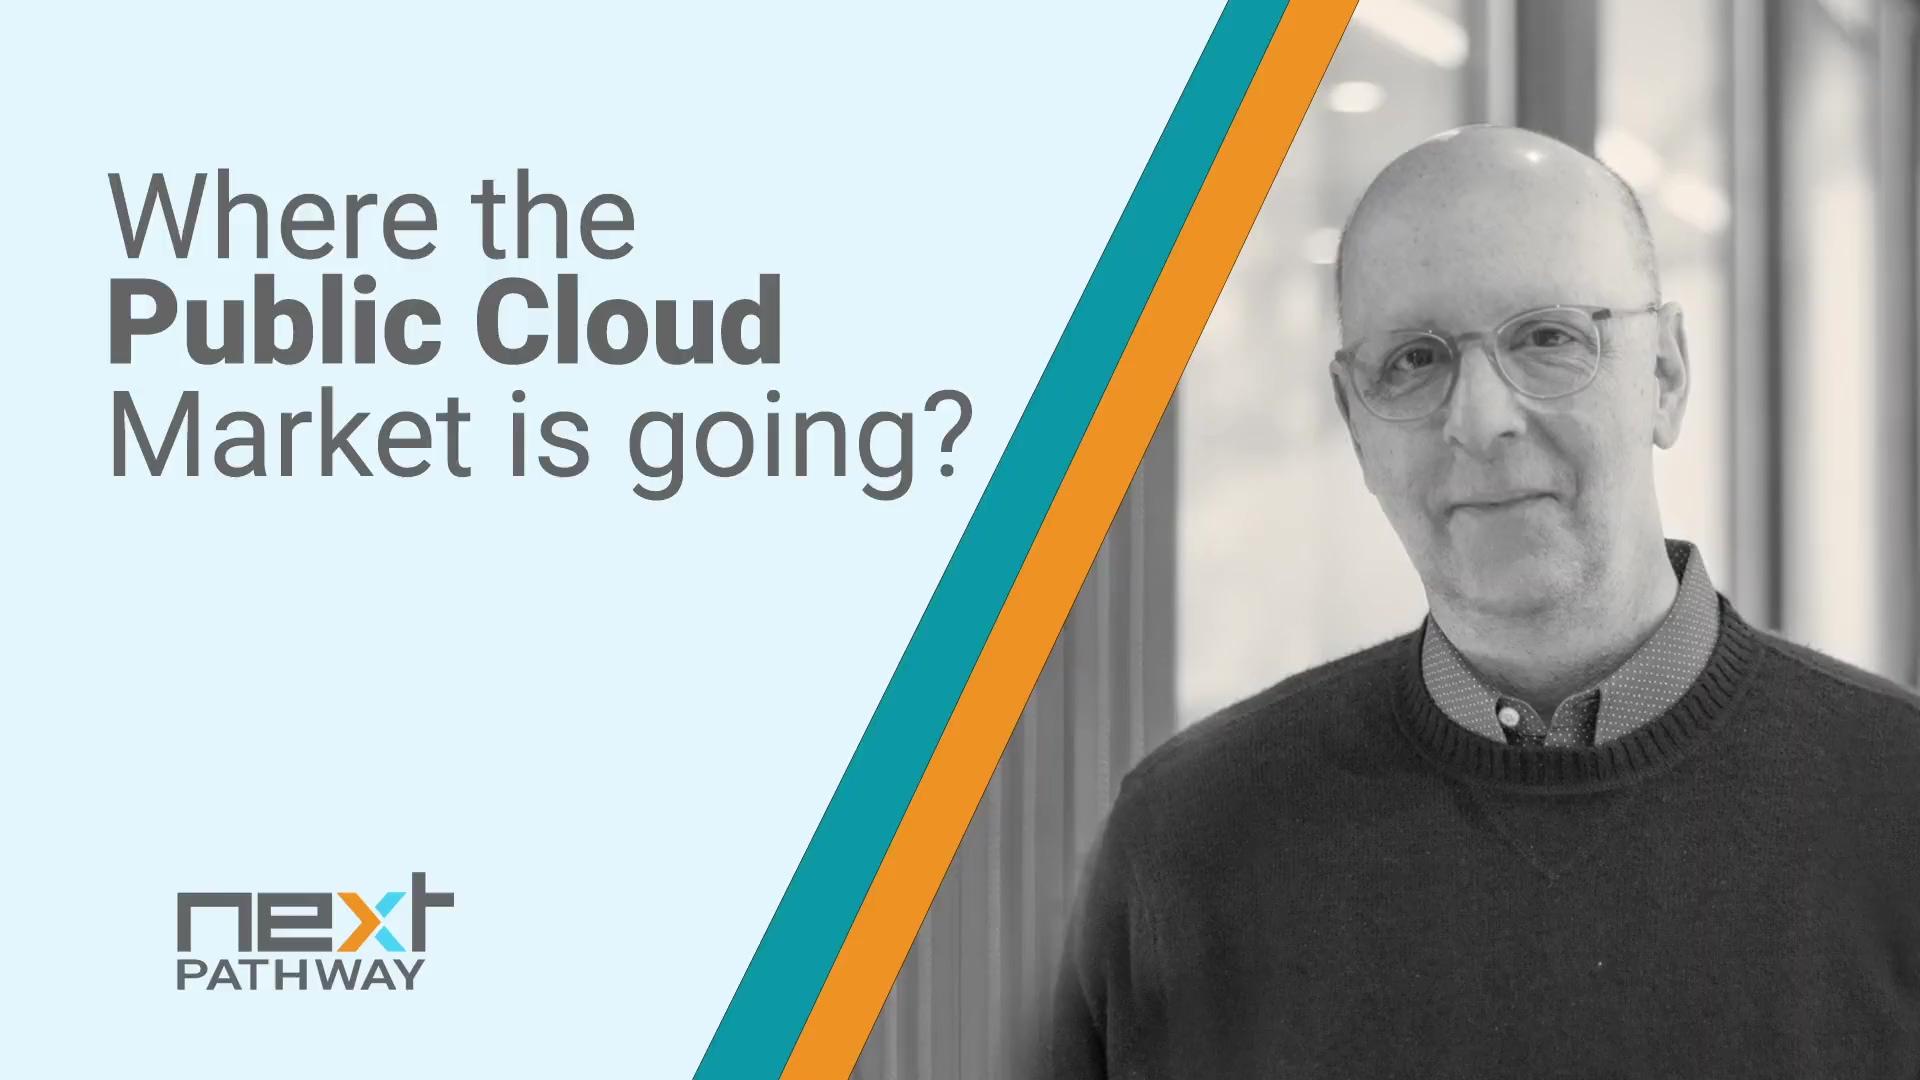 The Future of the Public Cloud